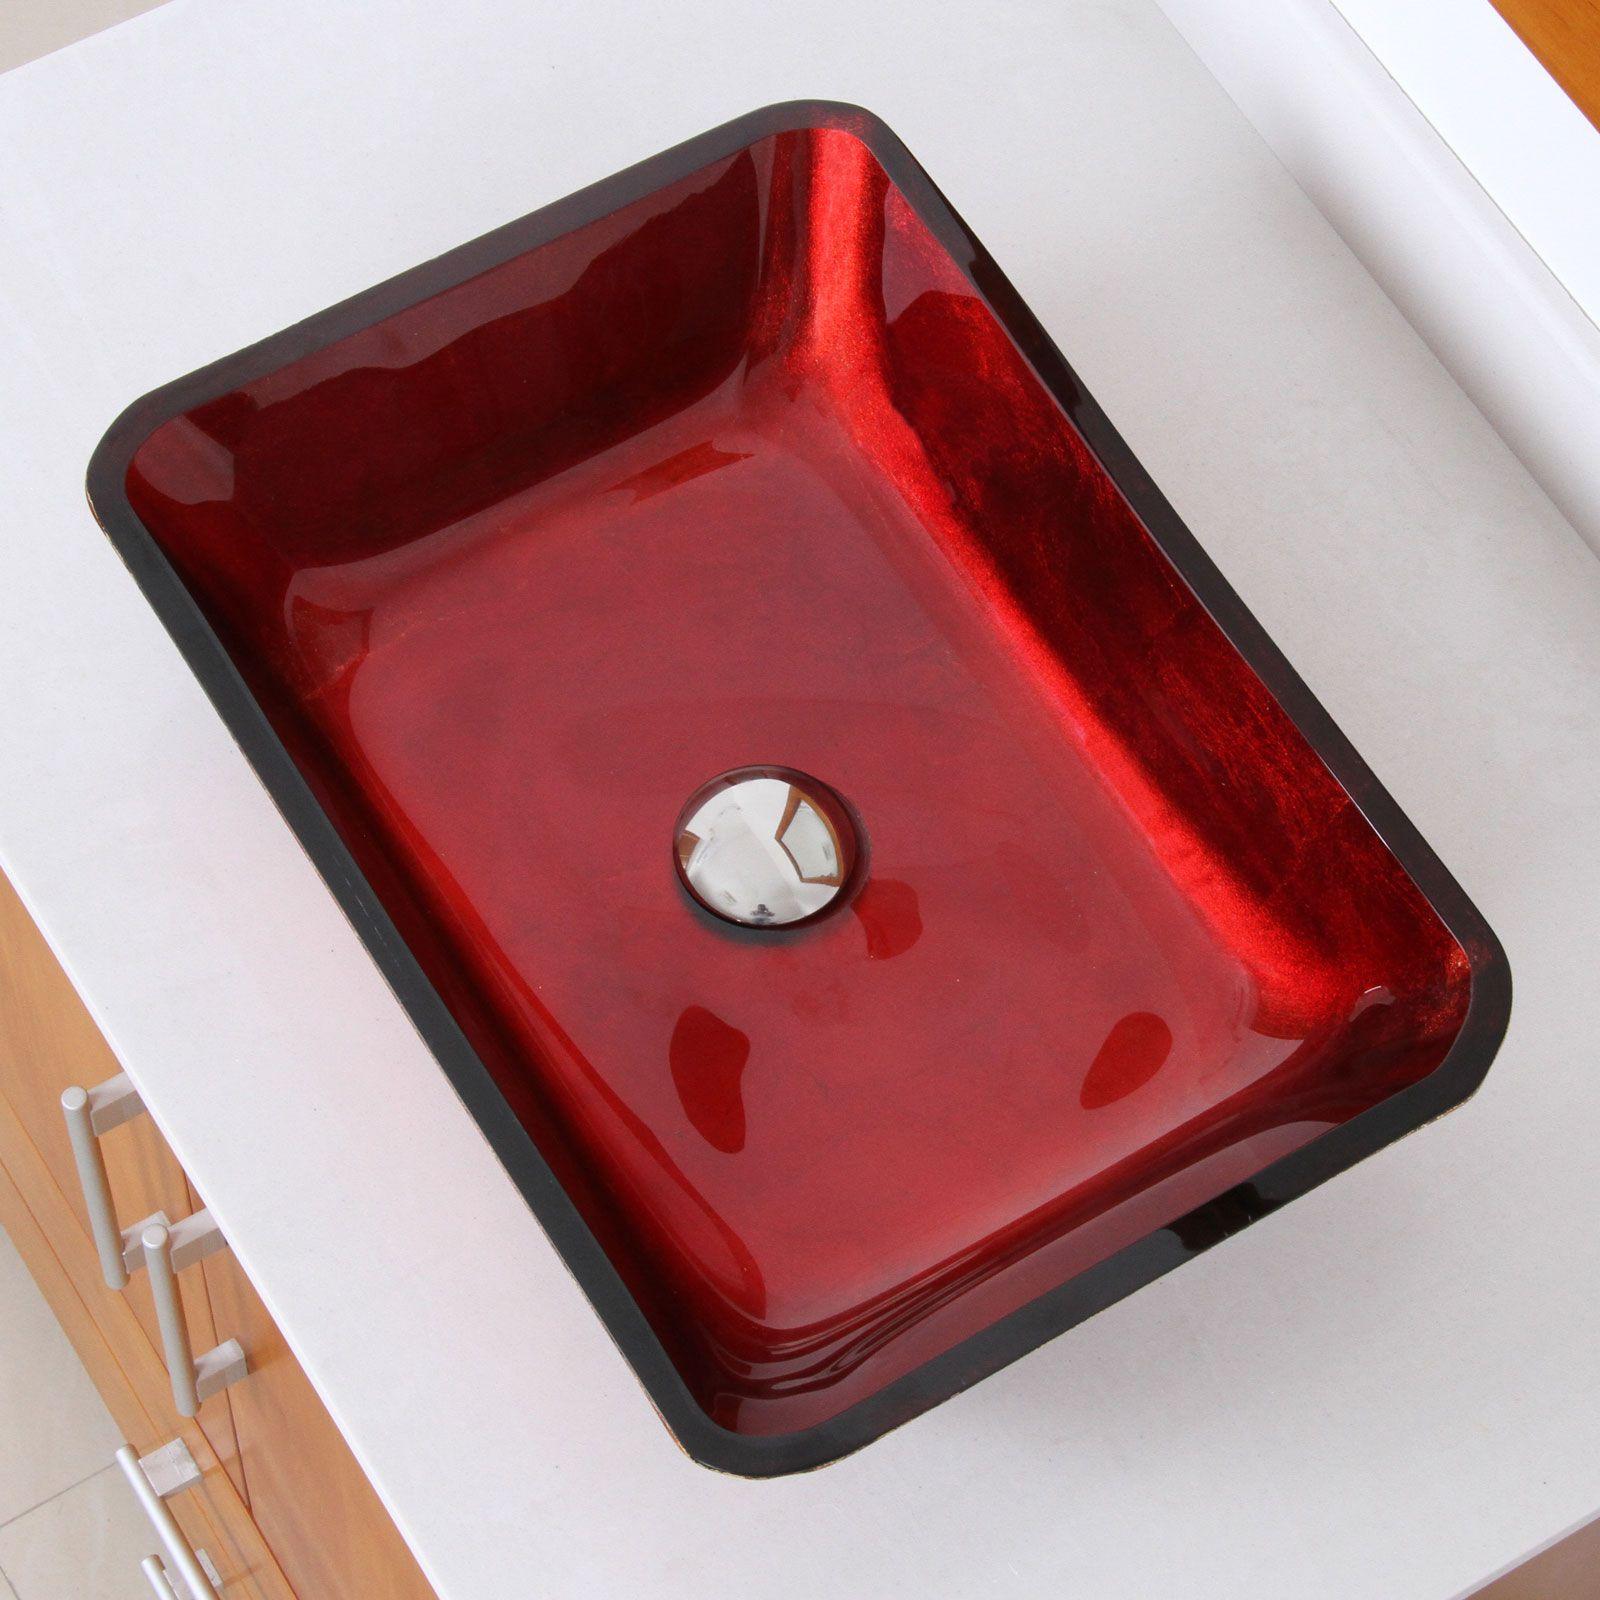 Elite 1410 Rectangle Mahogany Tempered Glass Bathroom Vessel Sink